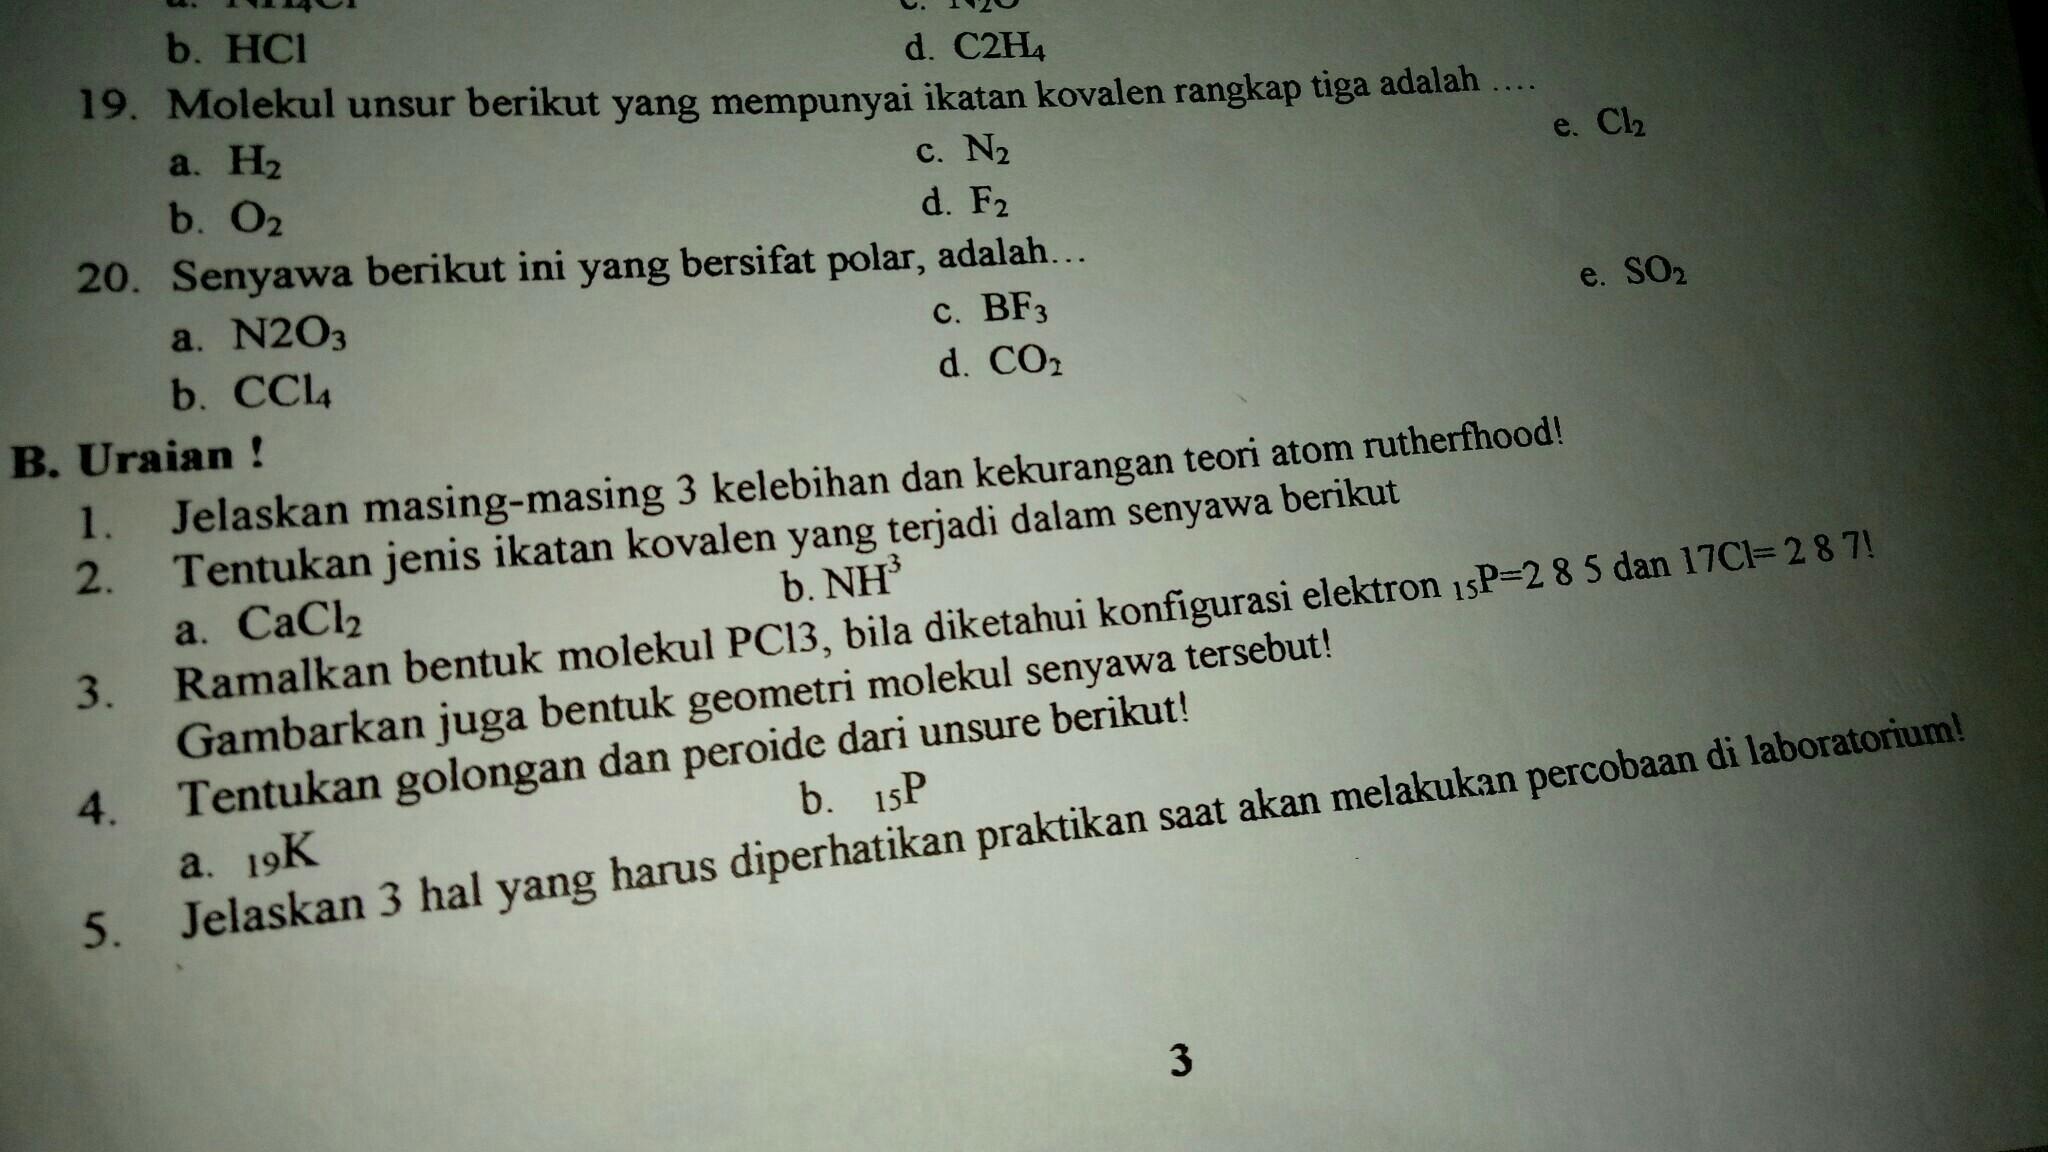 Tolong Di Jawab Nomor 3 Dan 2 Ya Kak Brainly Co Id